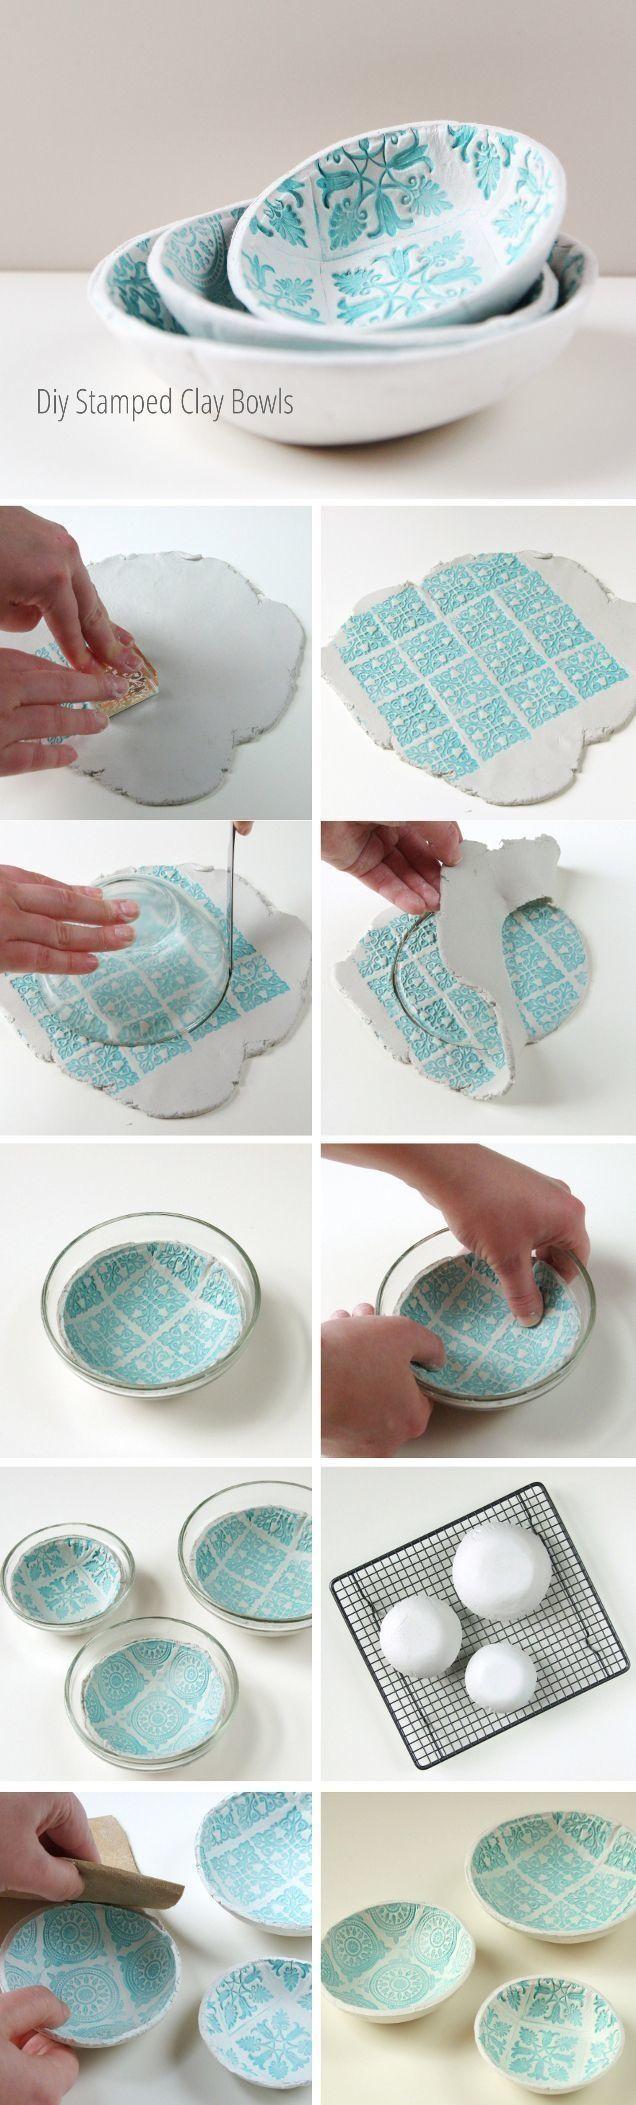 Beautifully textured bowls